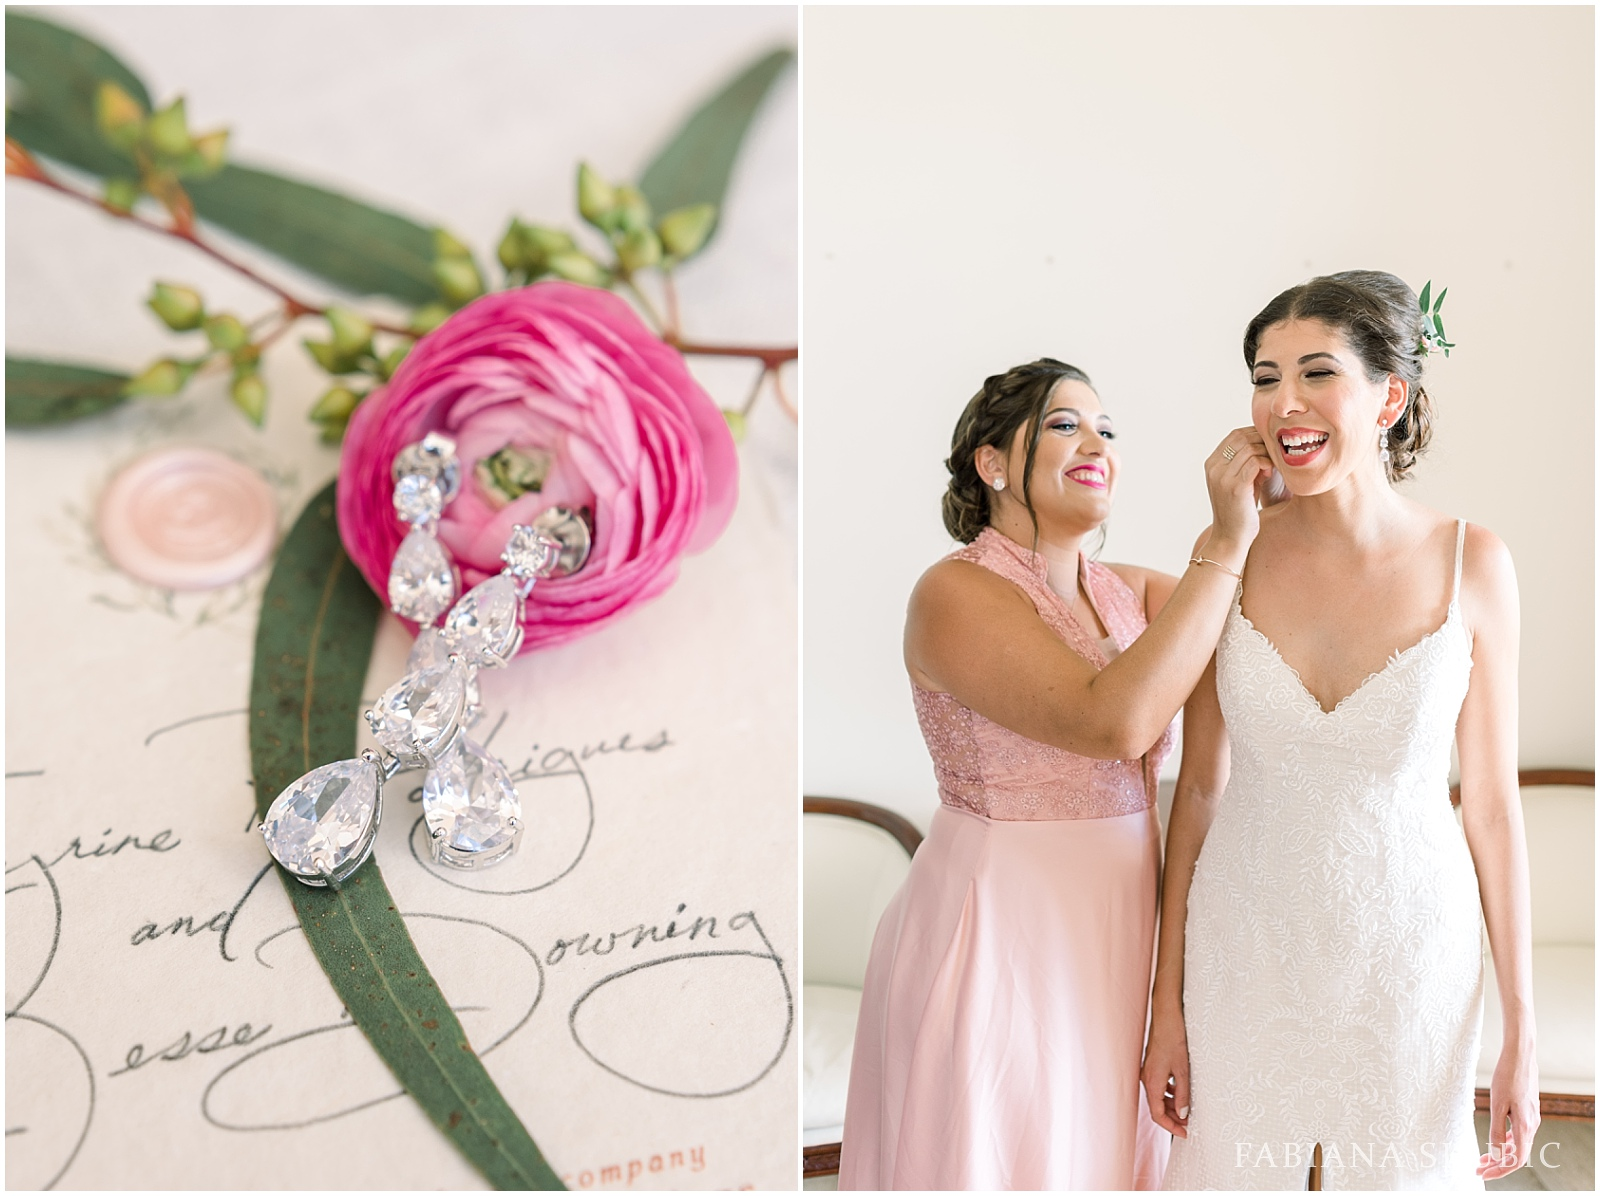 TJ_Now_Sapphire_Riviera_Cancun_Mexico_Wedding_Photos_0165.jpg